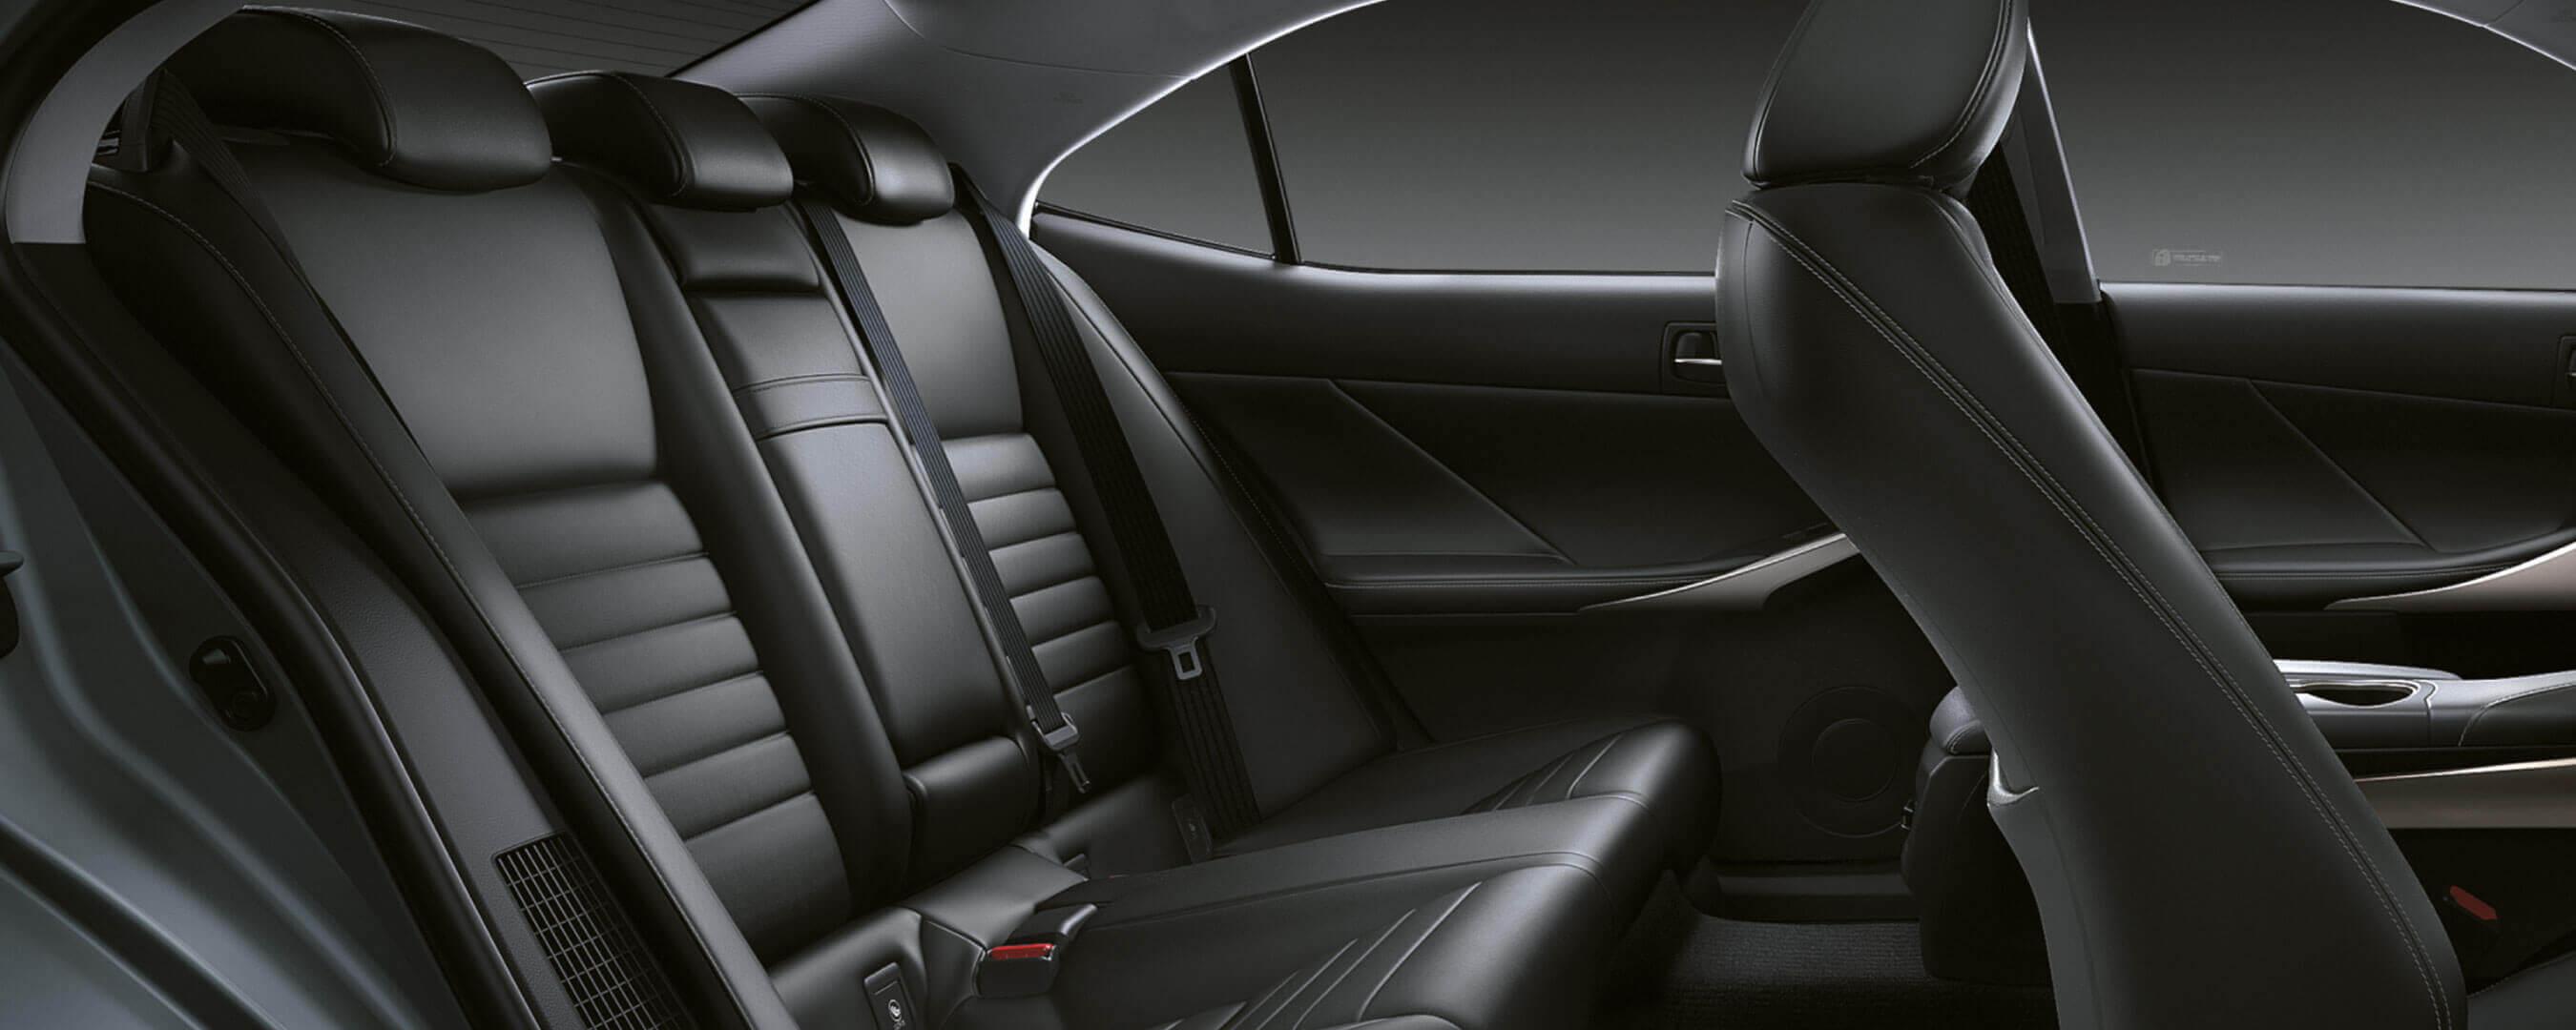 2017 lexus is 300h experience hero interior back